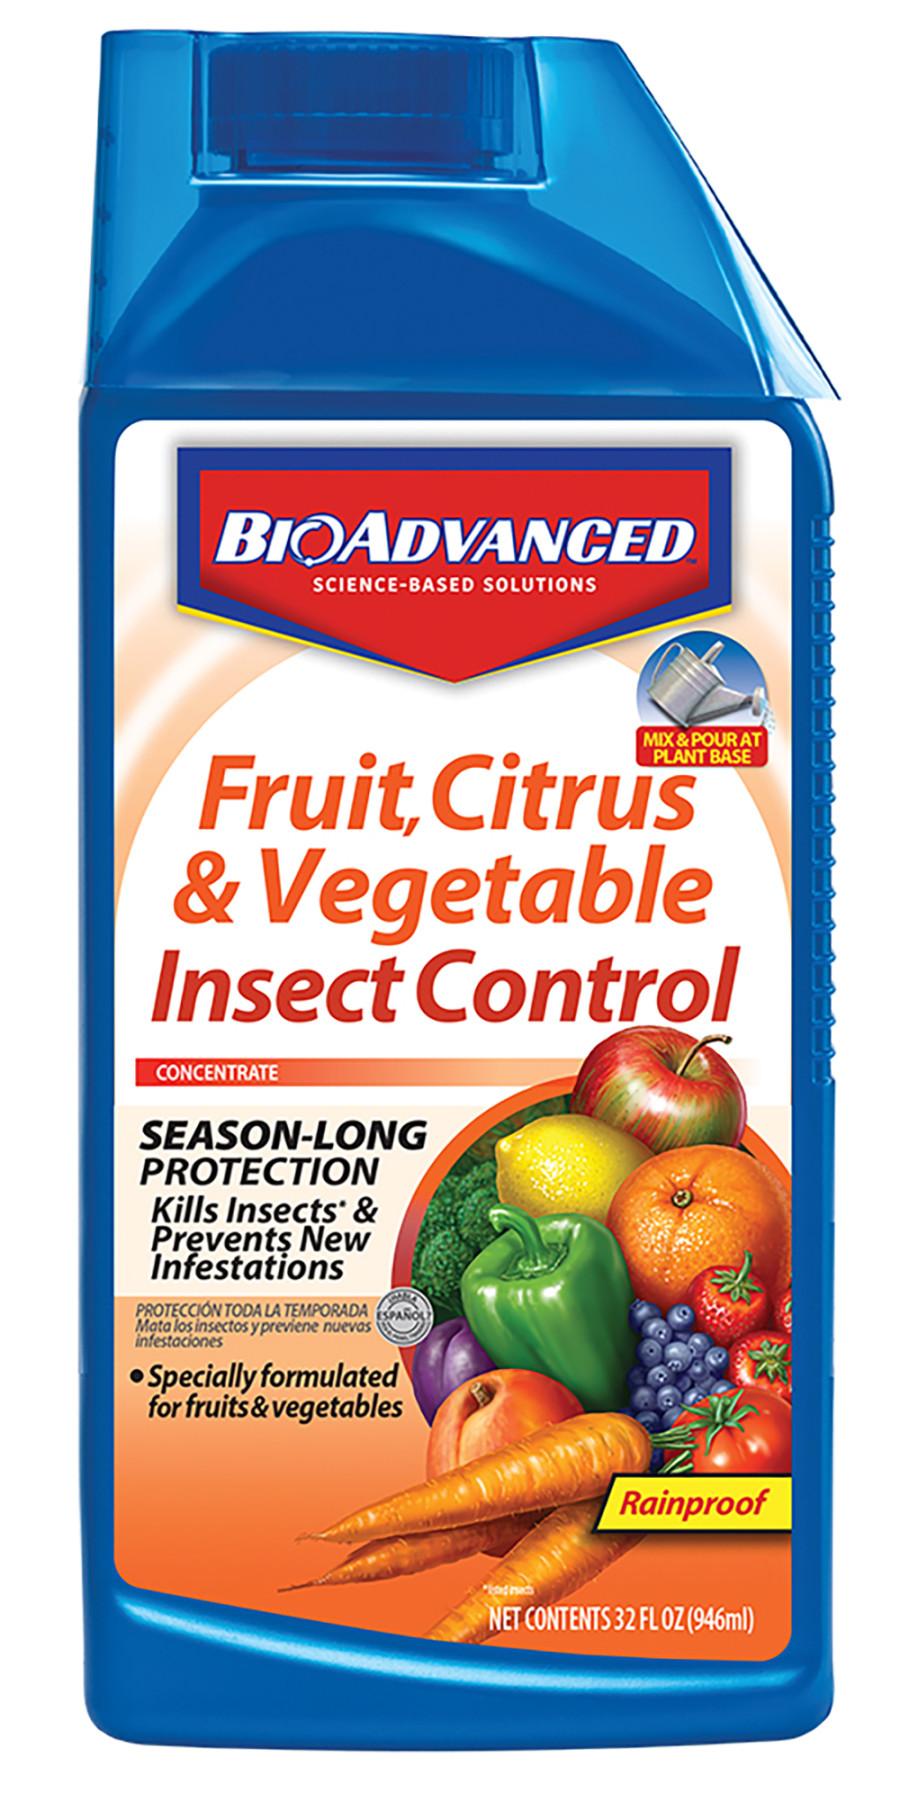 BioAdvanced Fruit Citrus Vegetable Insect Control Concentrate 8ea/32 fl oz